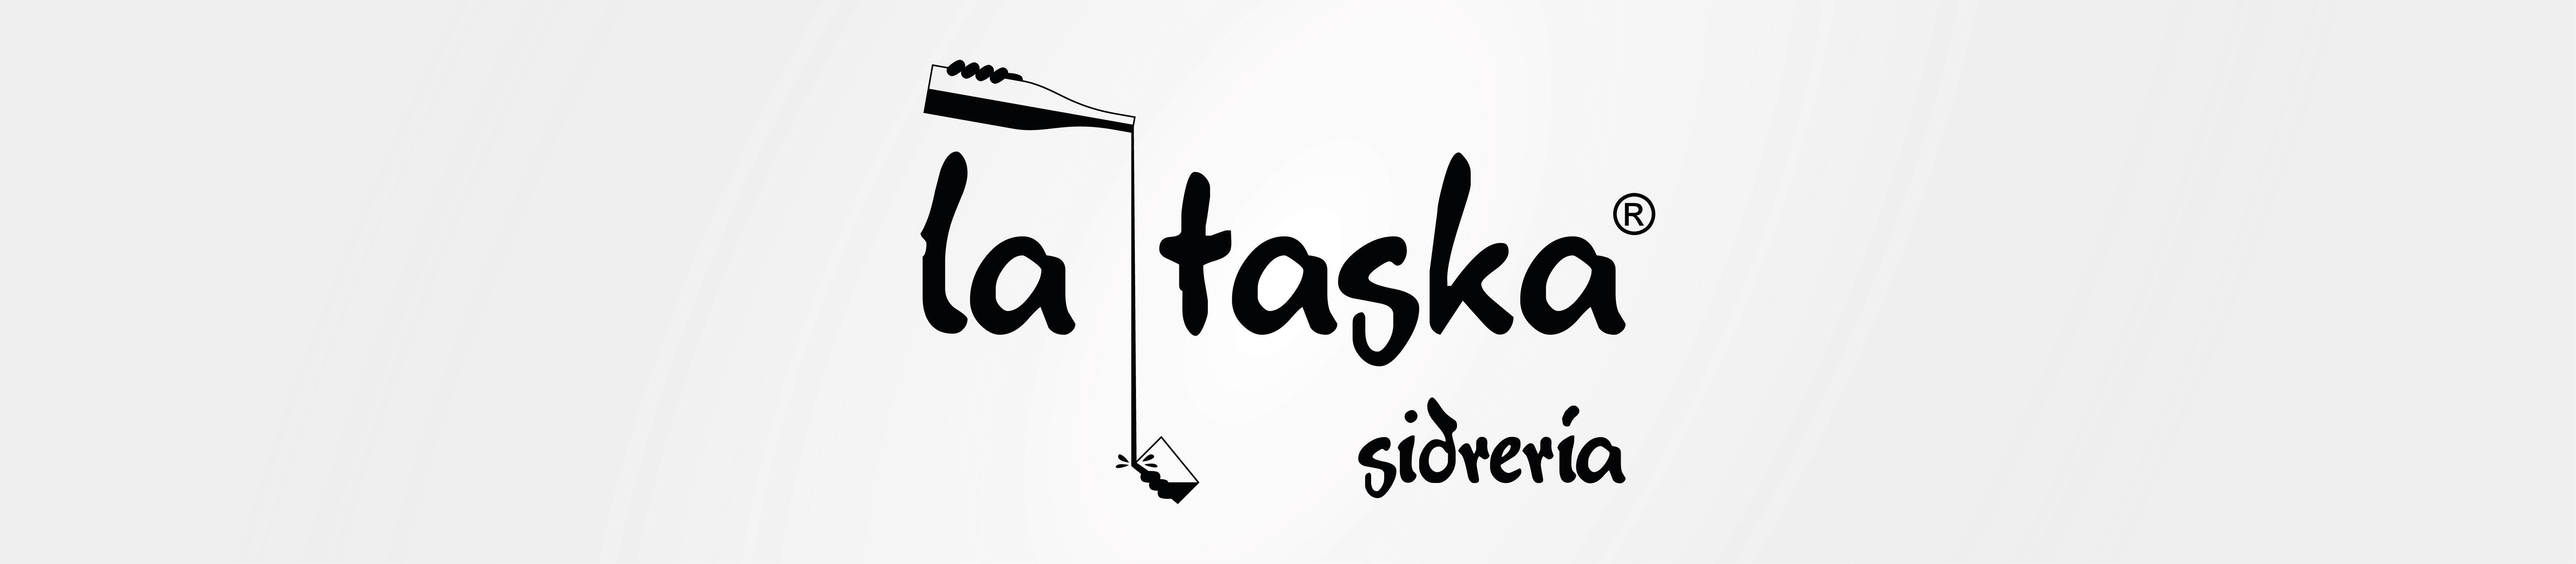 archicercle - logo la taska